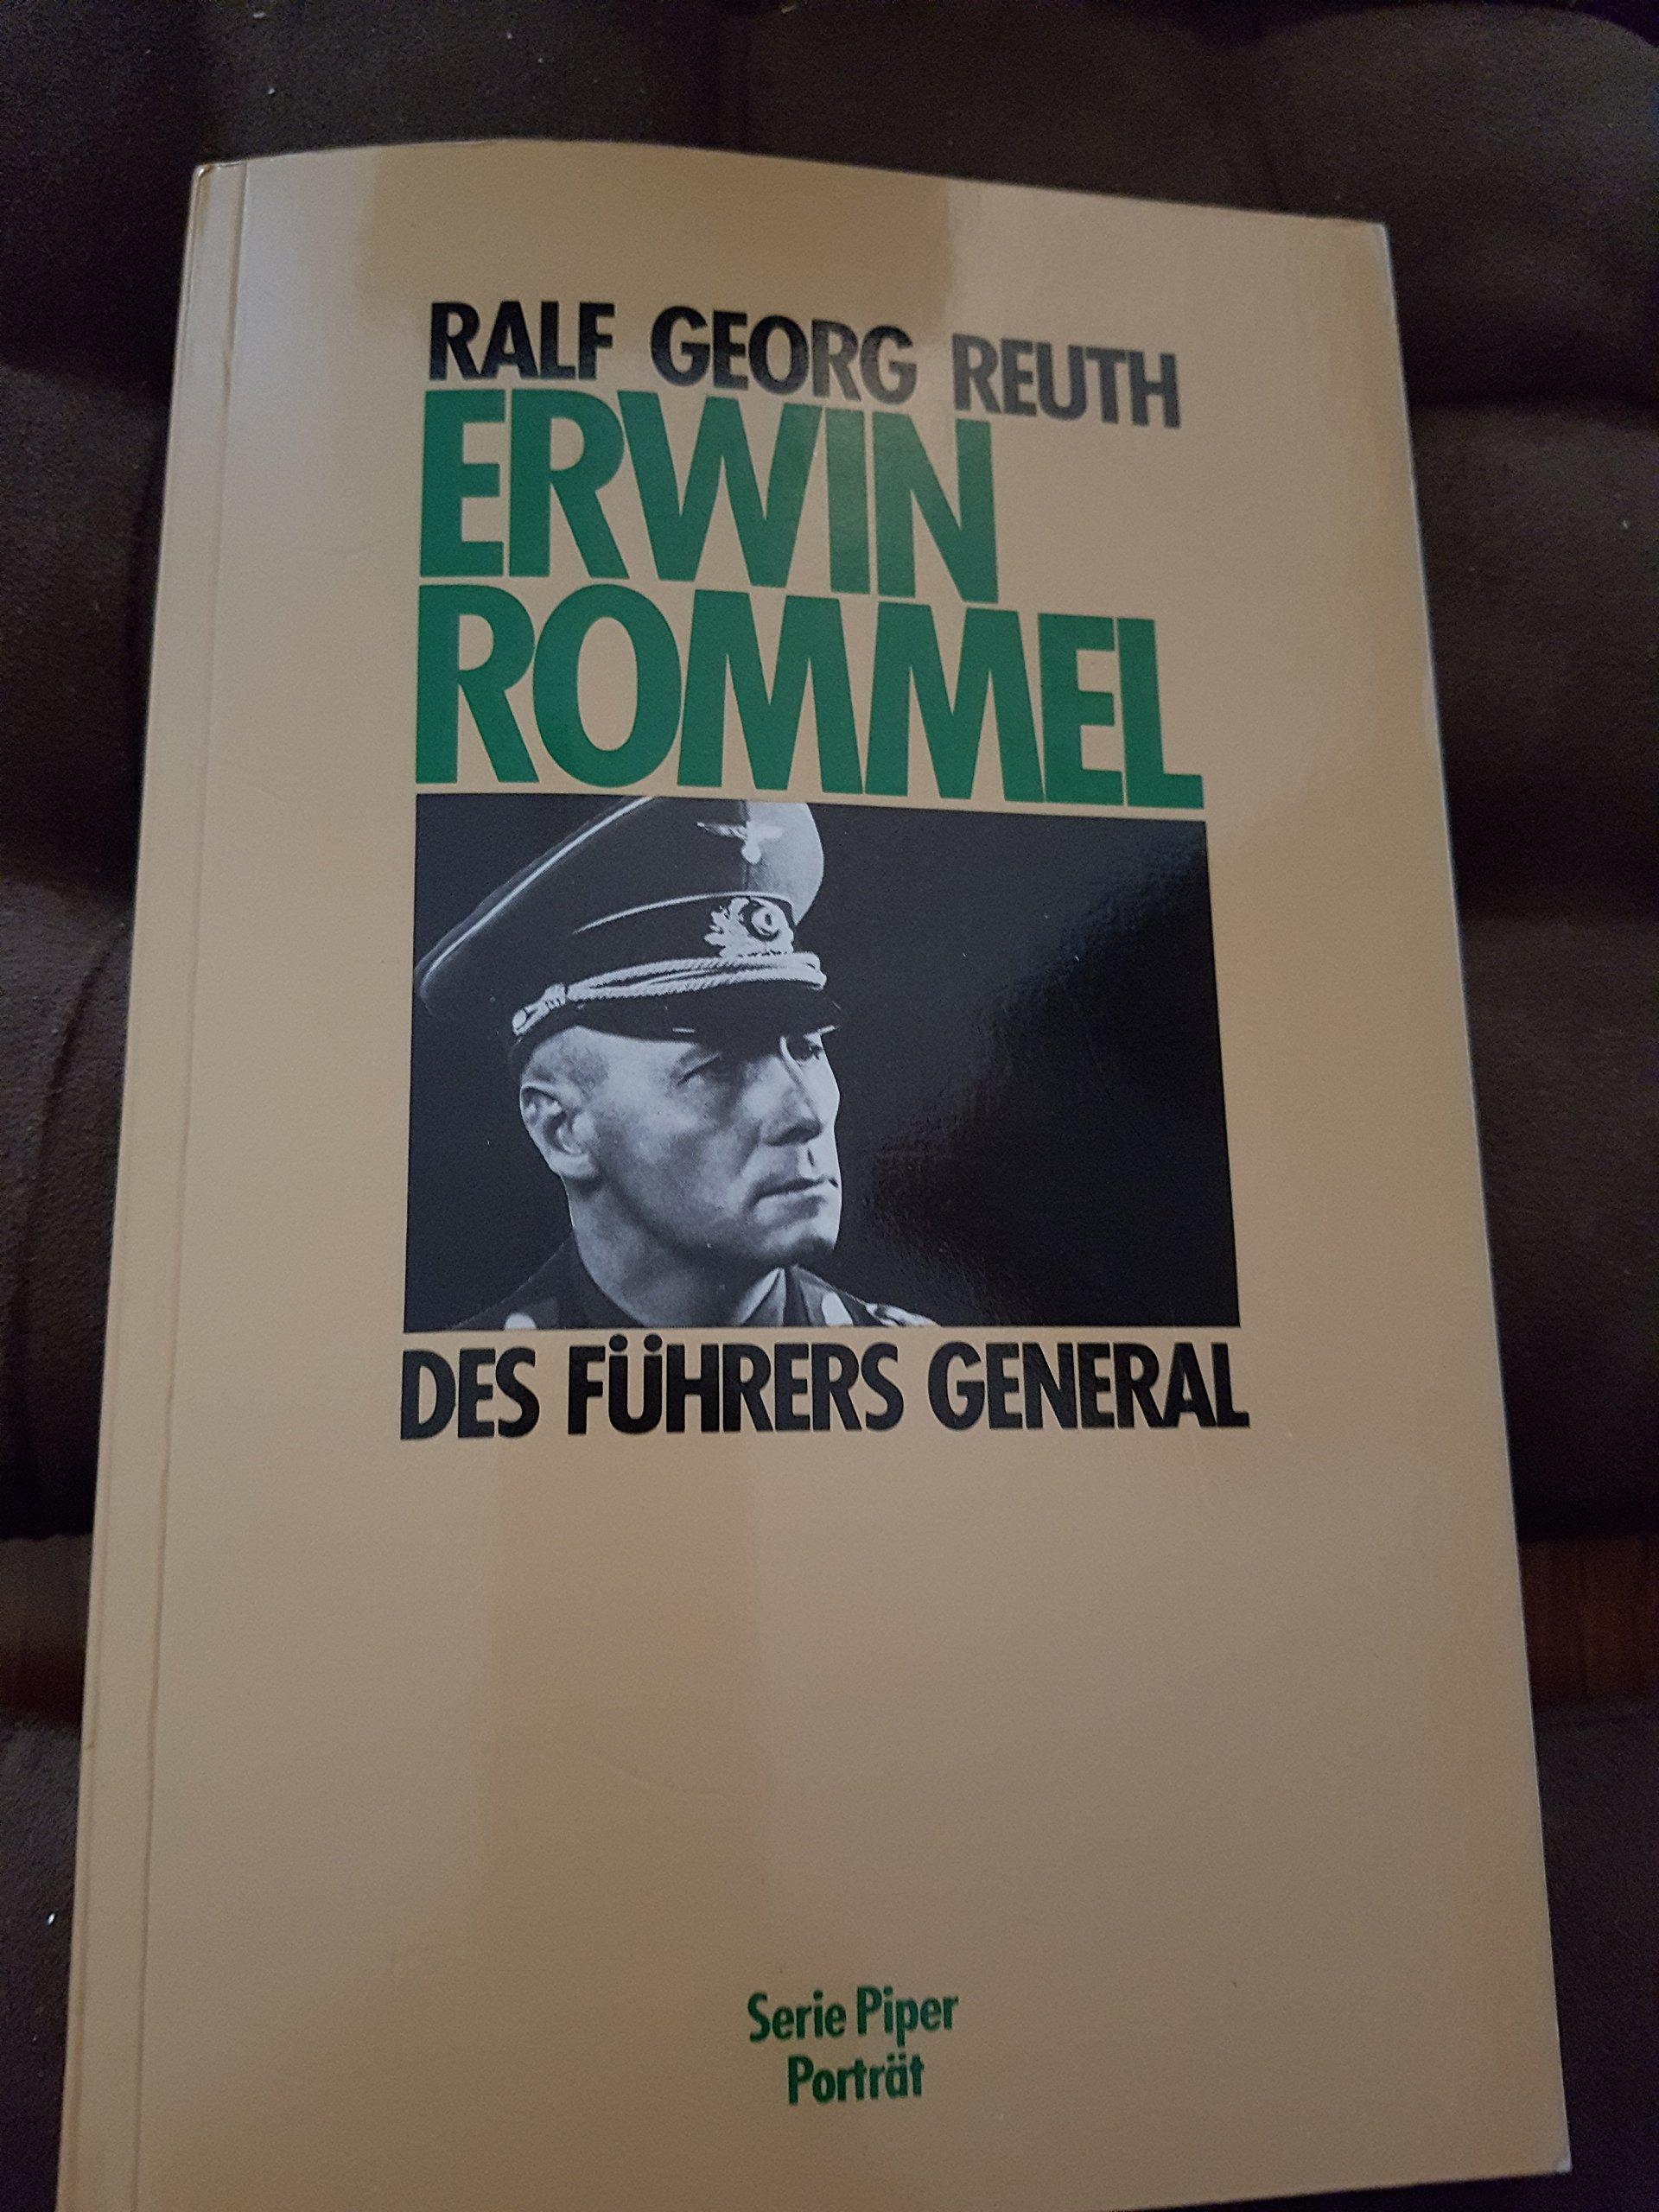 Erwin Rommel. Des Führers General